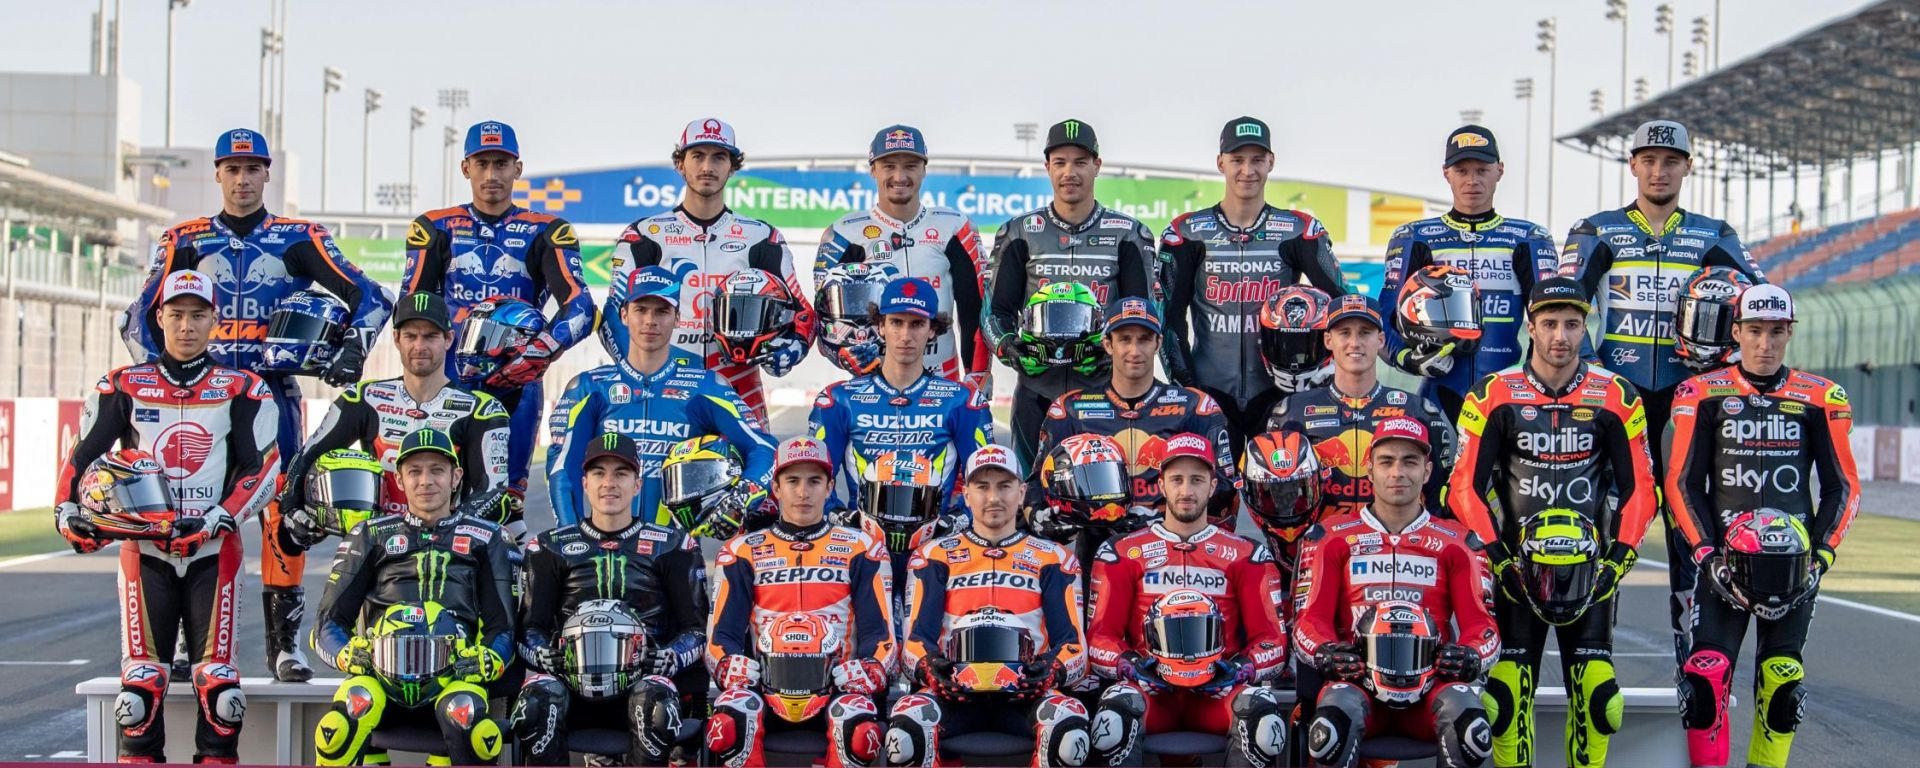 Team e piloti Motogp 2019: la lista completa